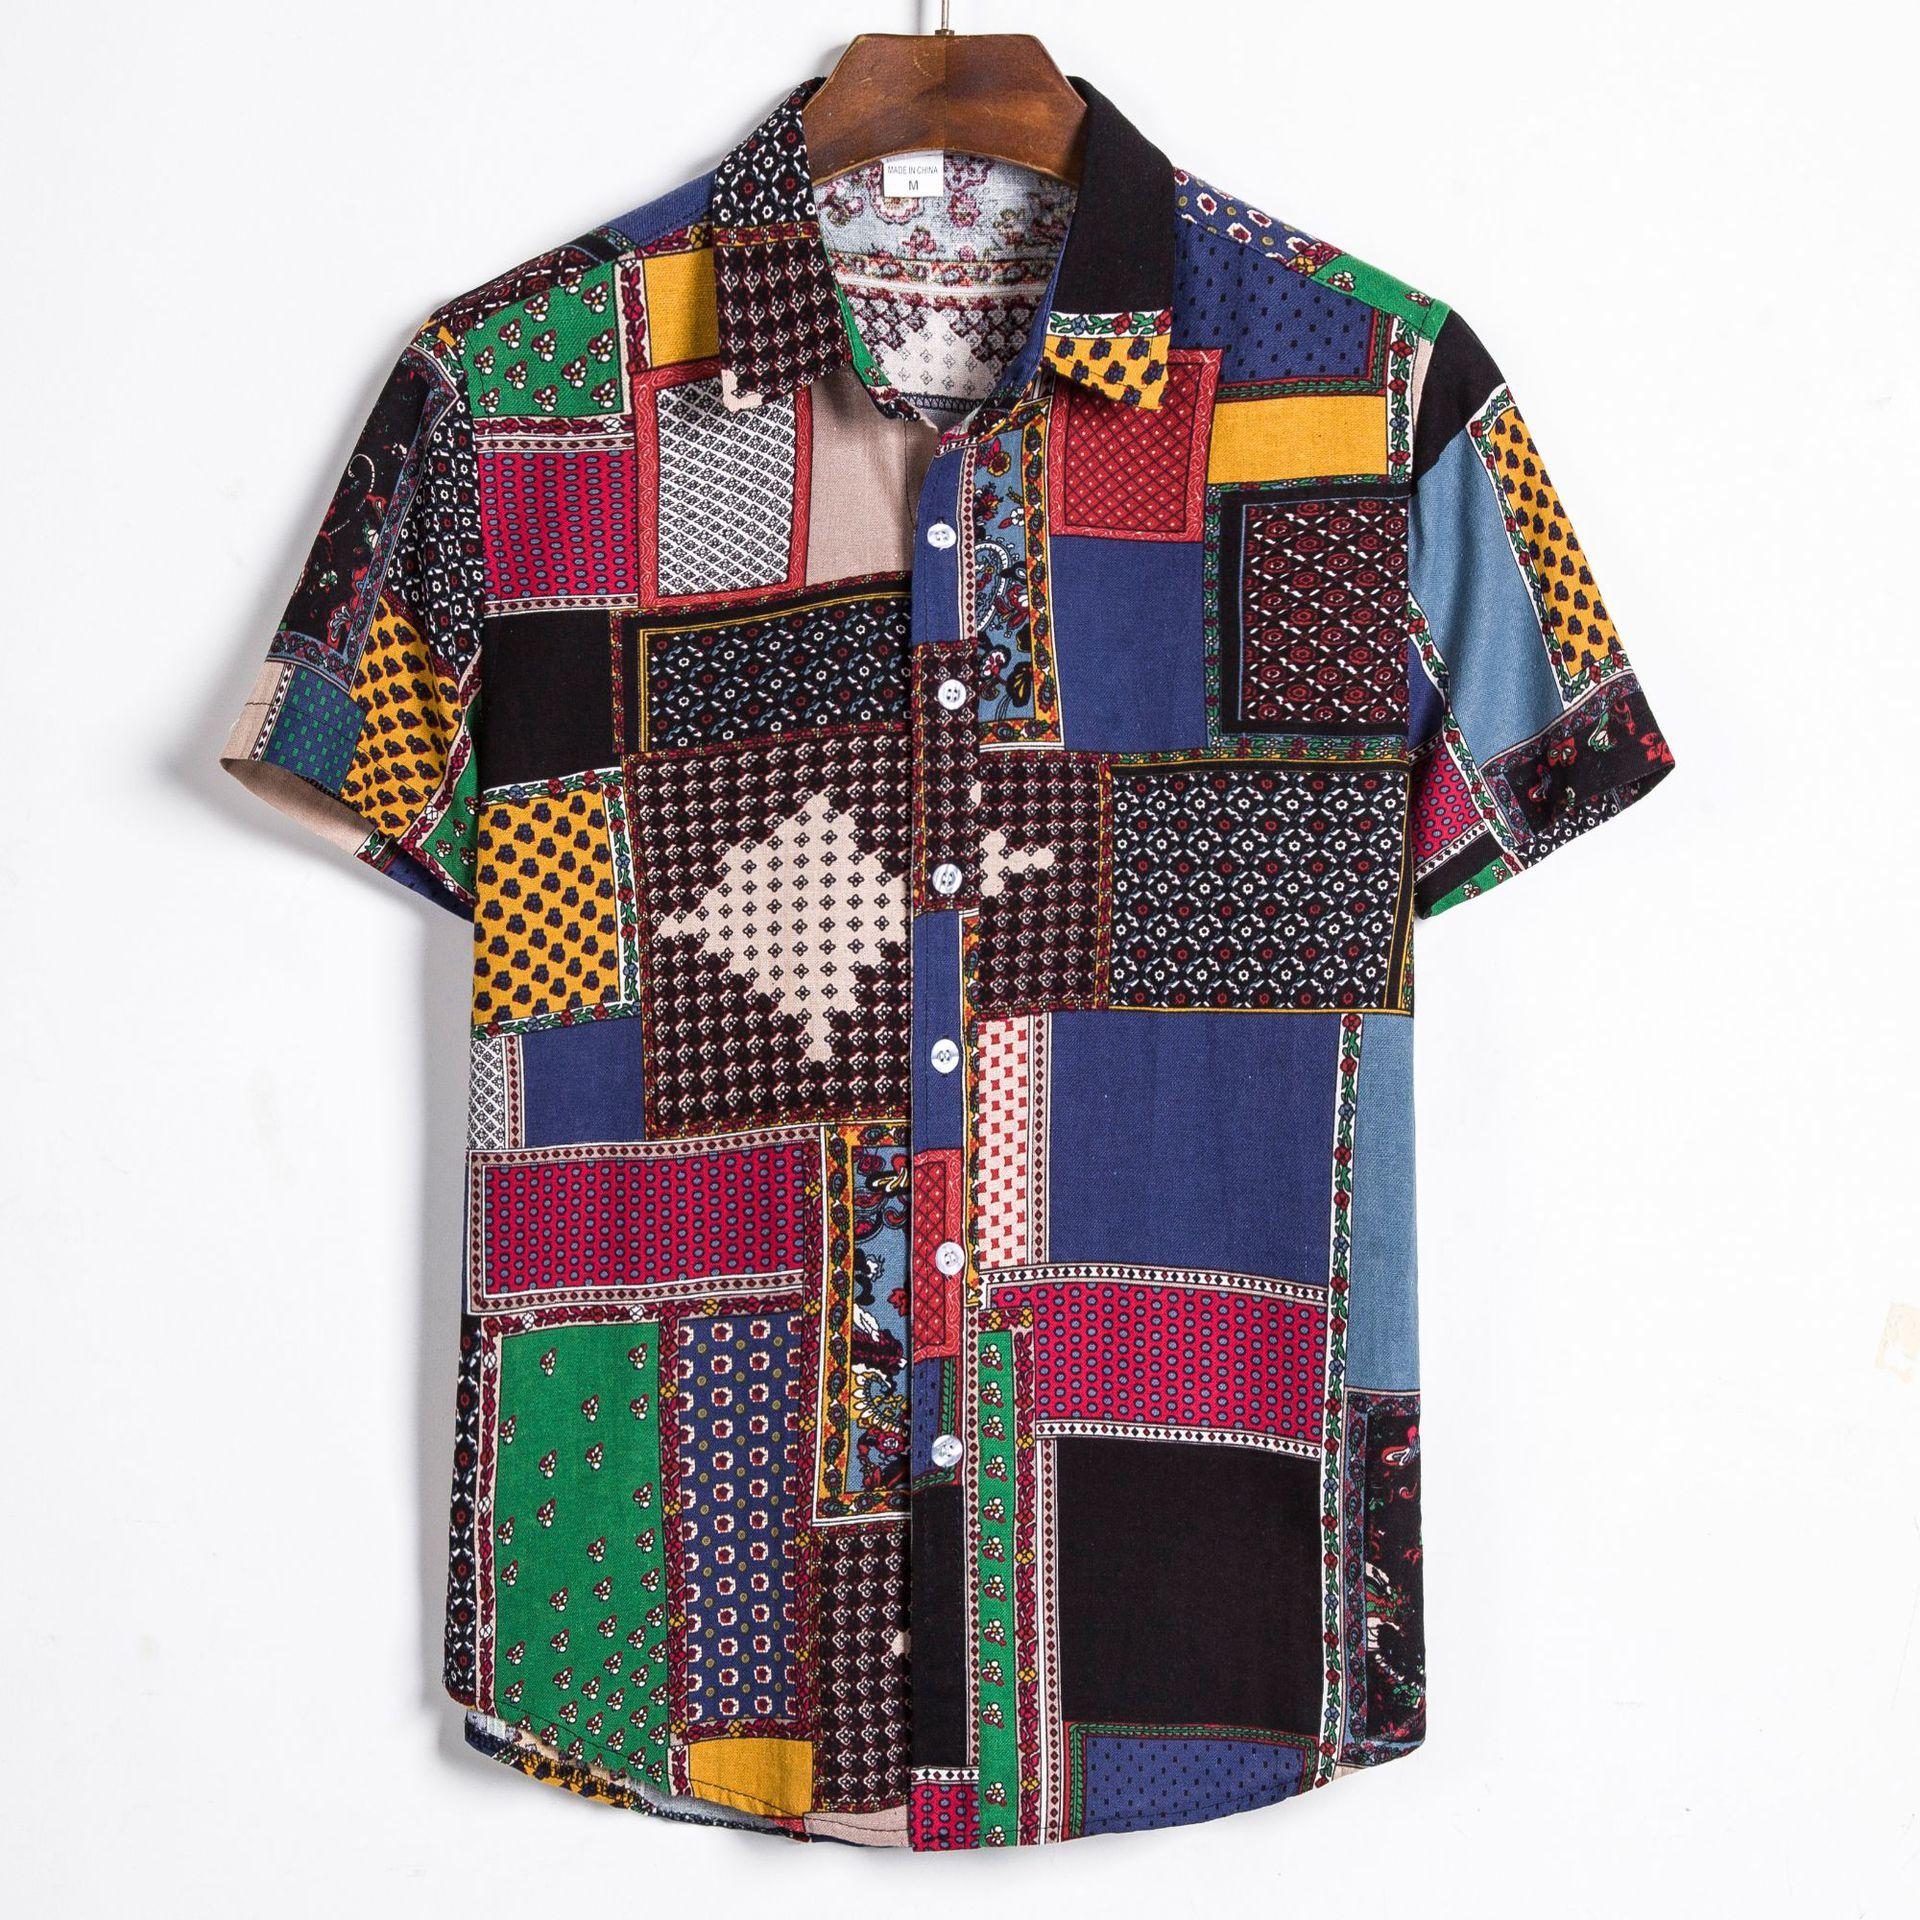 HOHO 2020 Men Summer New Style Ethnic-Style Print Shirt Youth Cotton Linen Short Sleeve Print Shirt